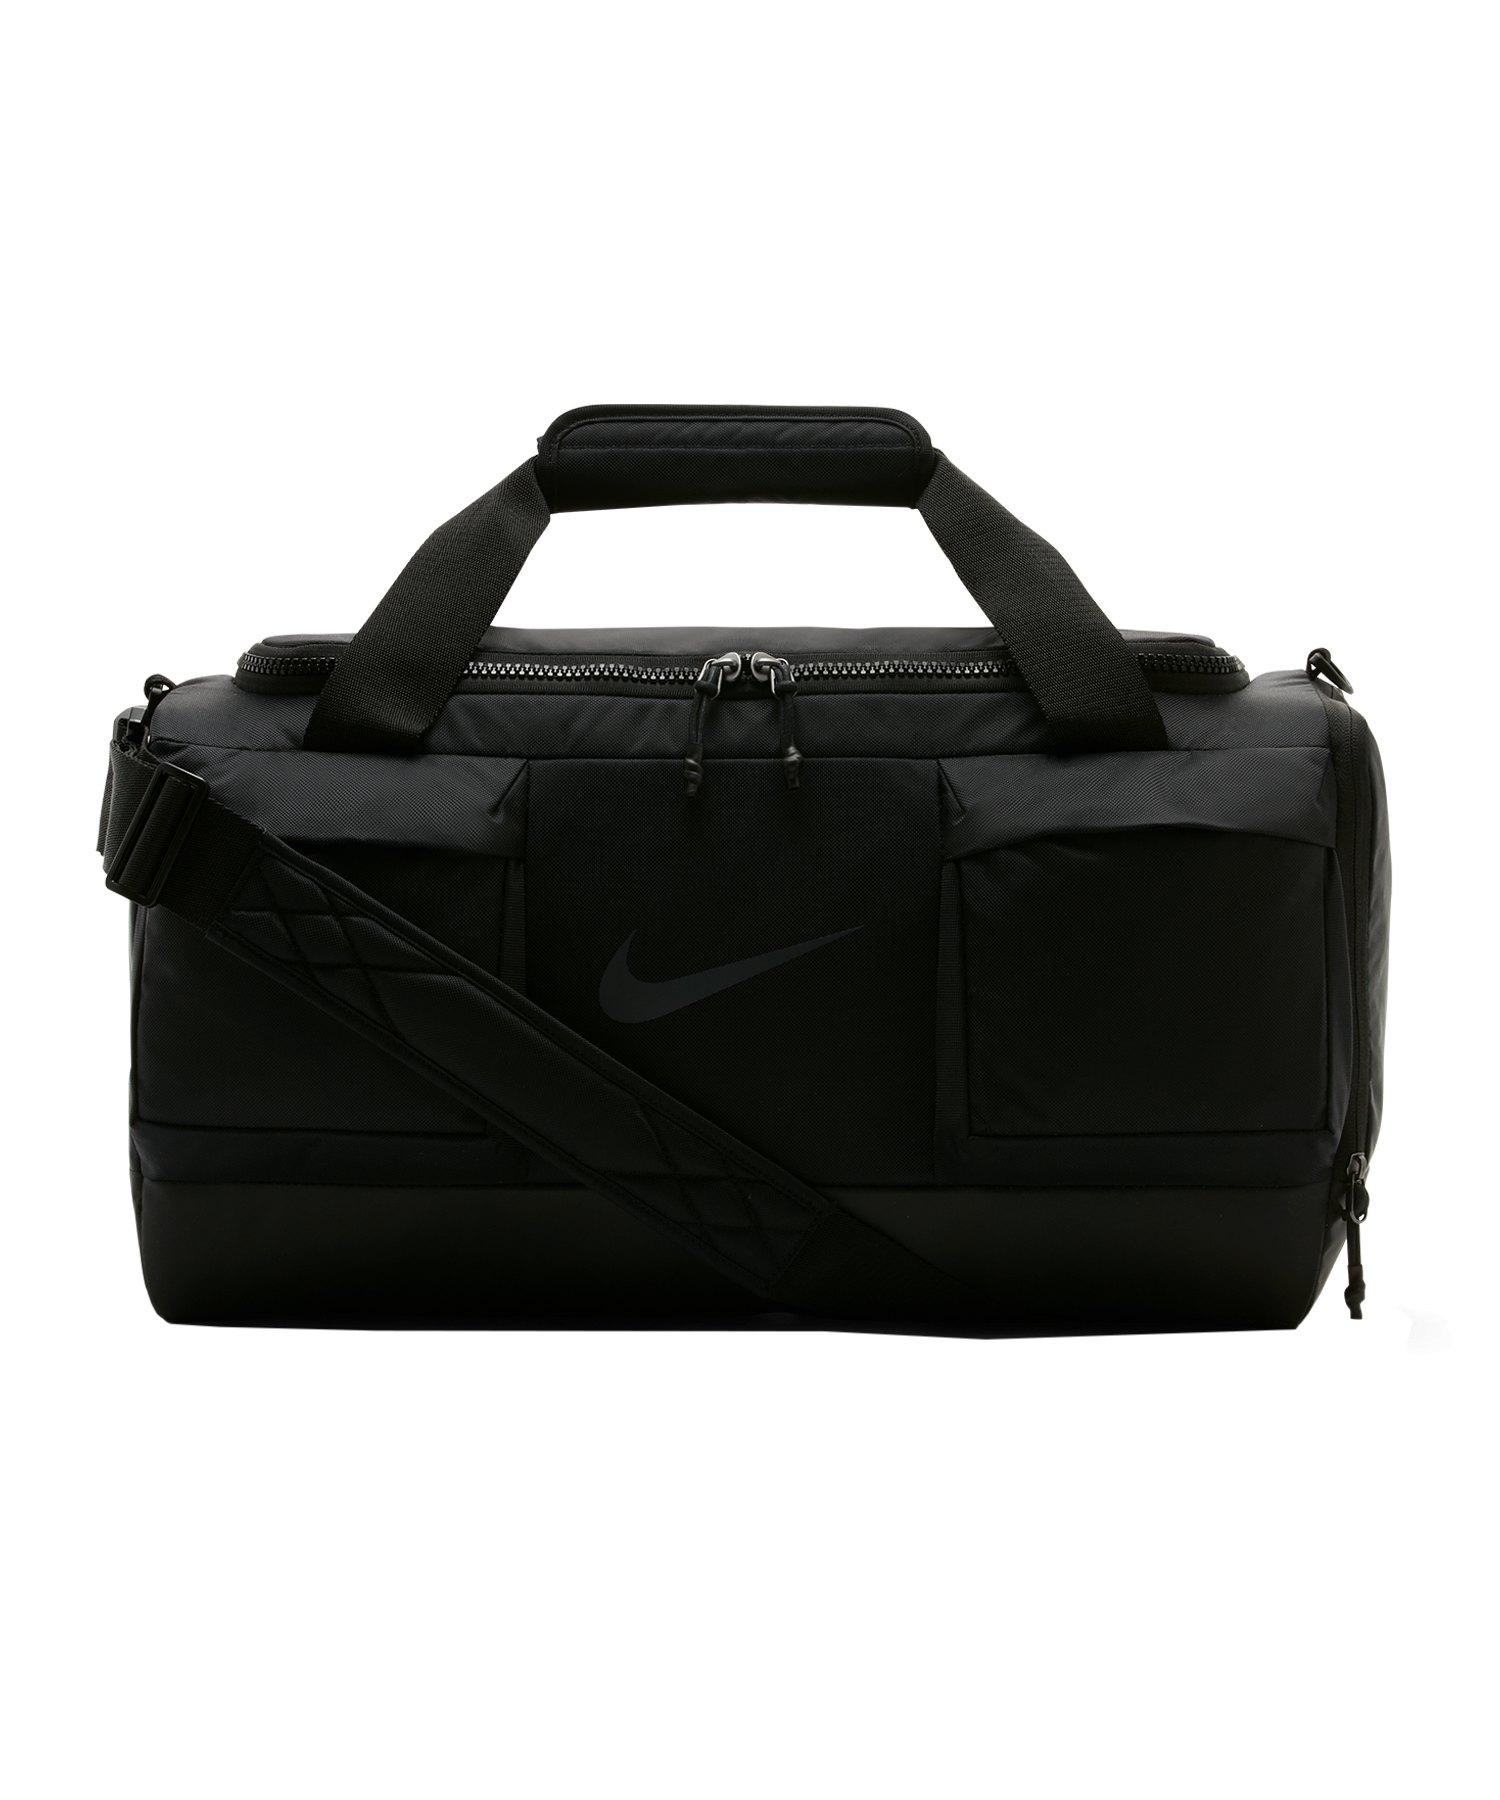 Nike Vapor Power Duffel Tasche Small Schwarz F010 - schwarz